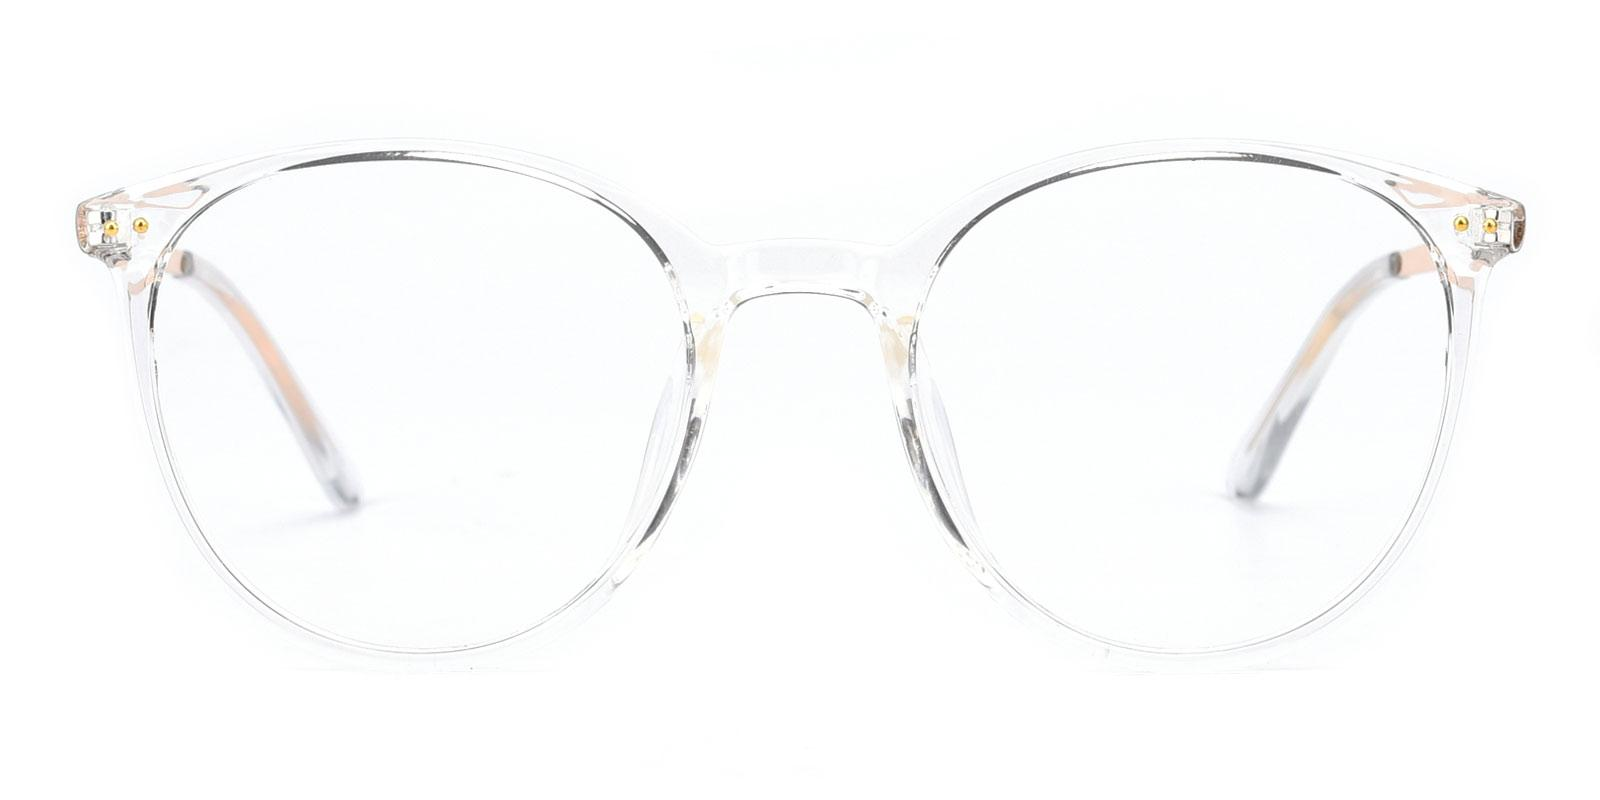 Peacock-Translucent-Round-Acetate-Eyeglasses-detail